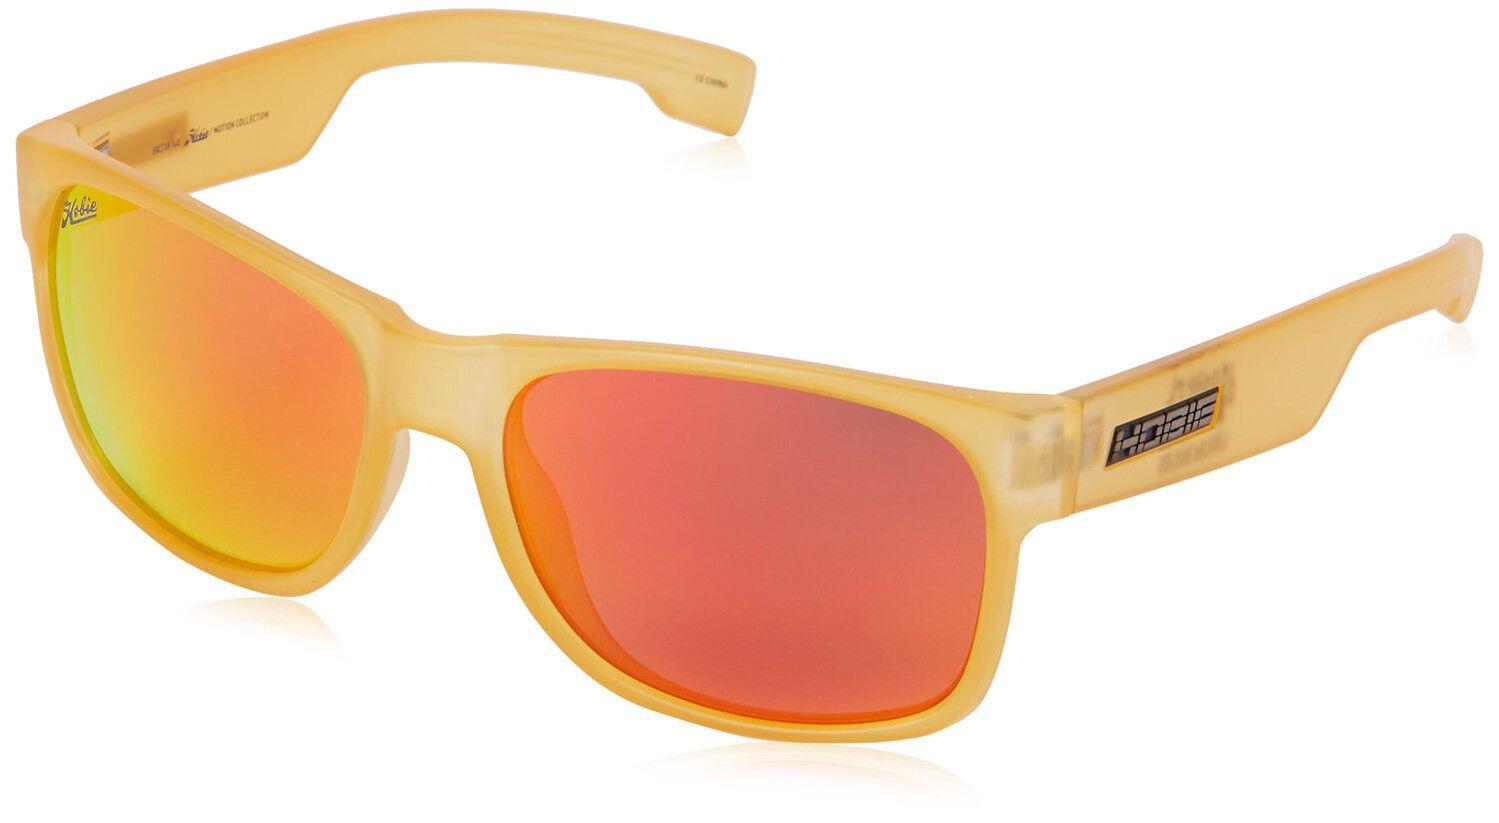 92f4389dee Hobie Dogpatch Polarized Sunglasses Satin Crystal Yellow Frame ...